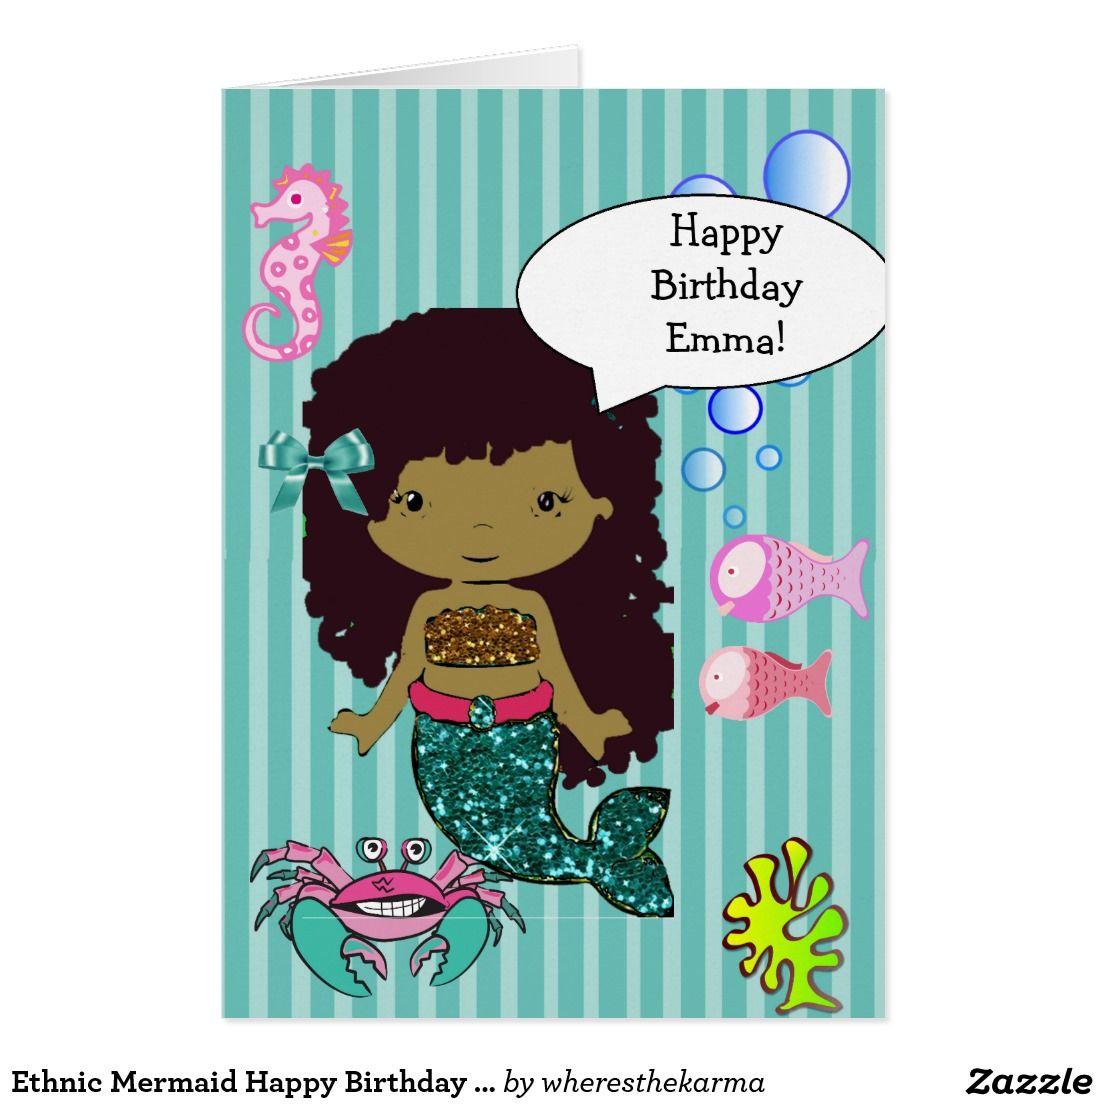 Ethnic Mermaid Happy Birthday Card